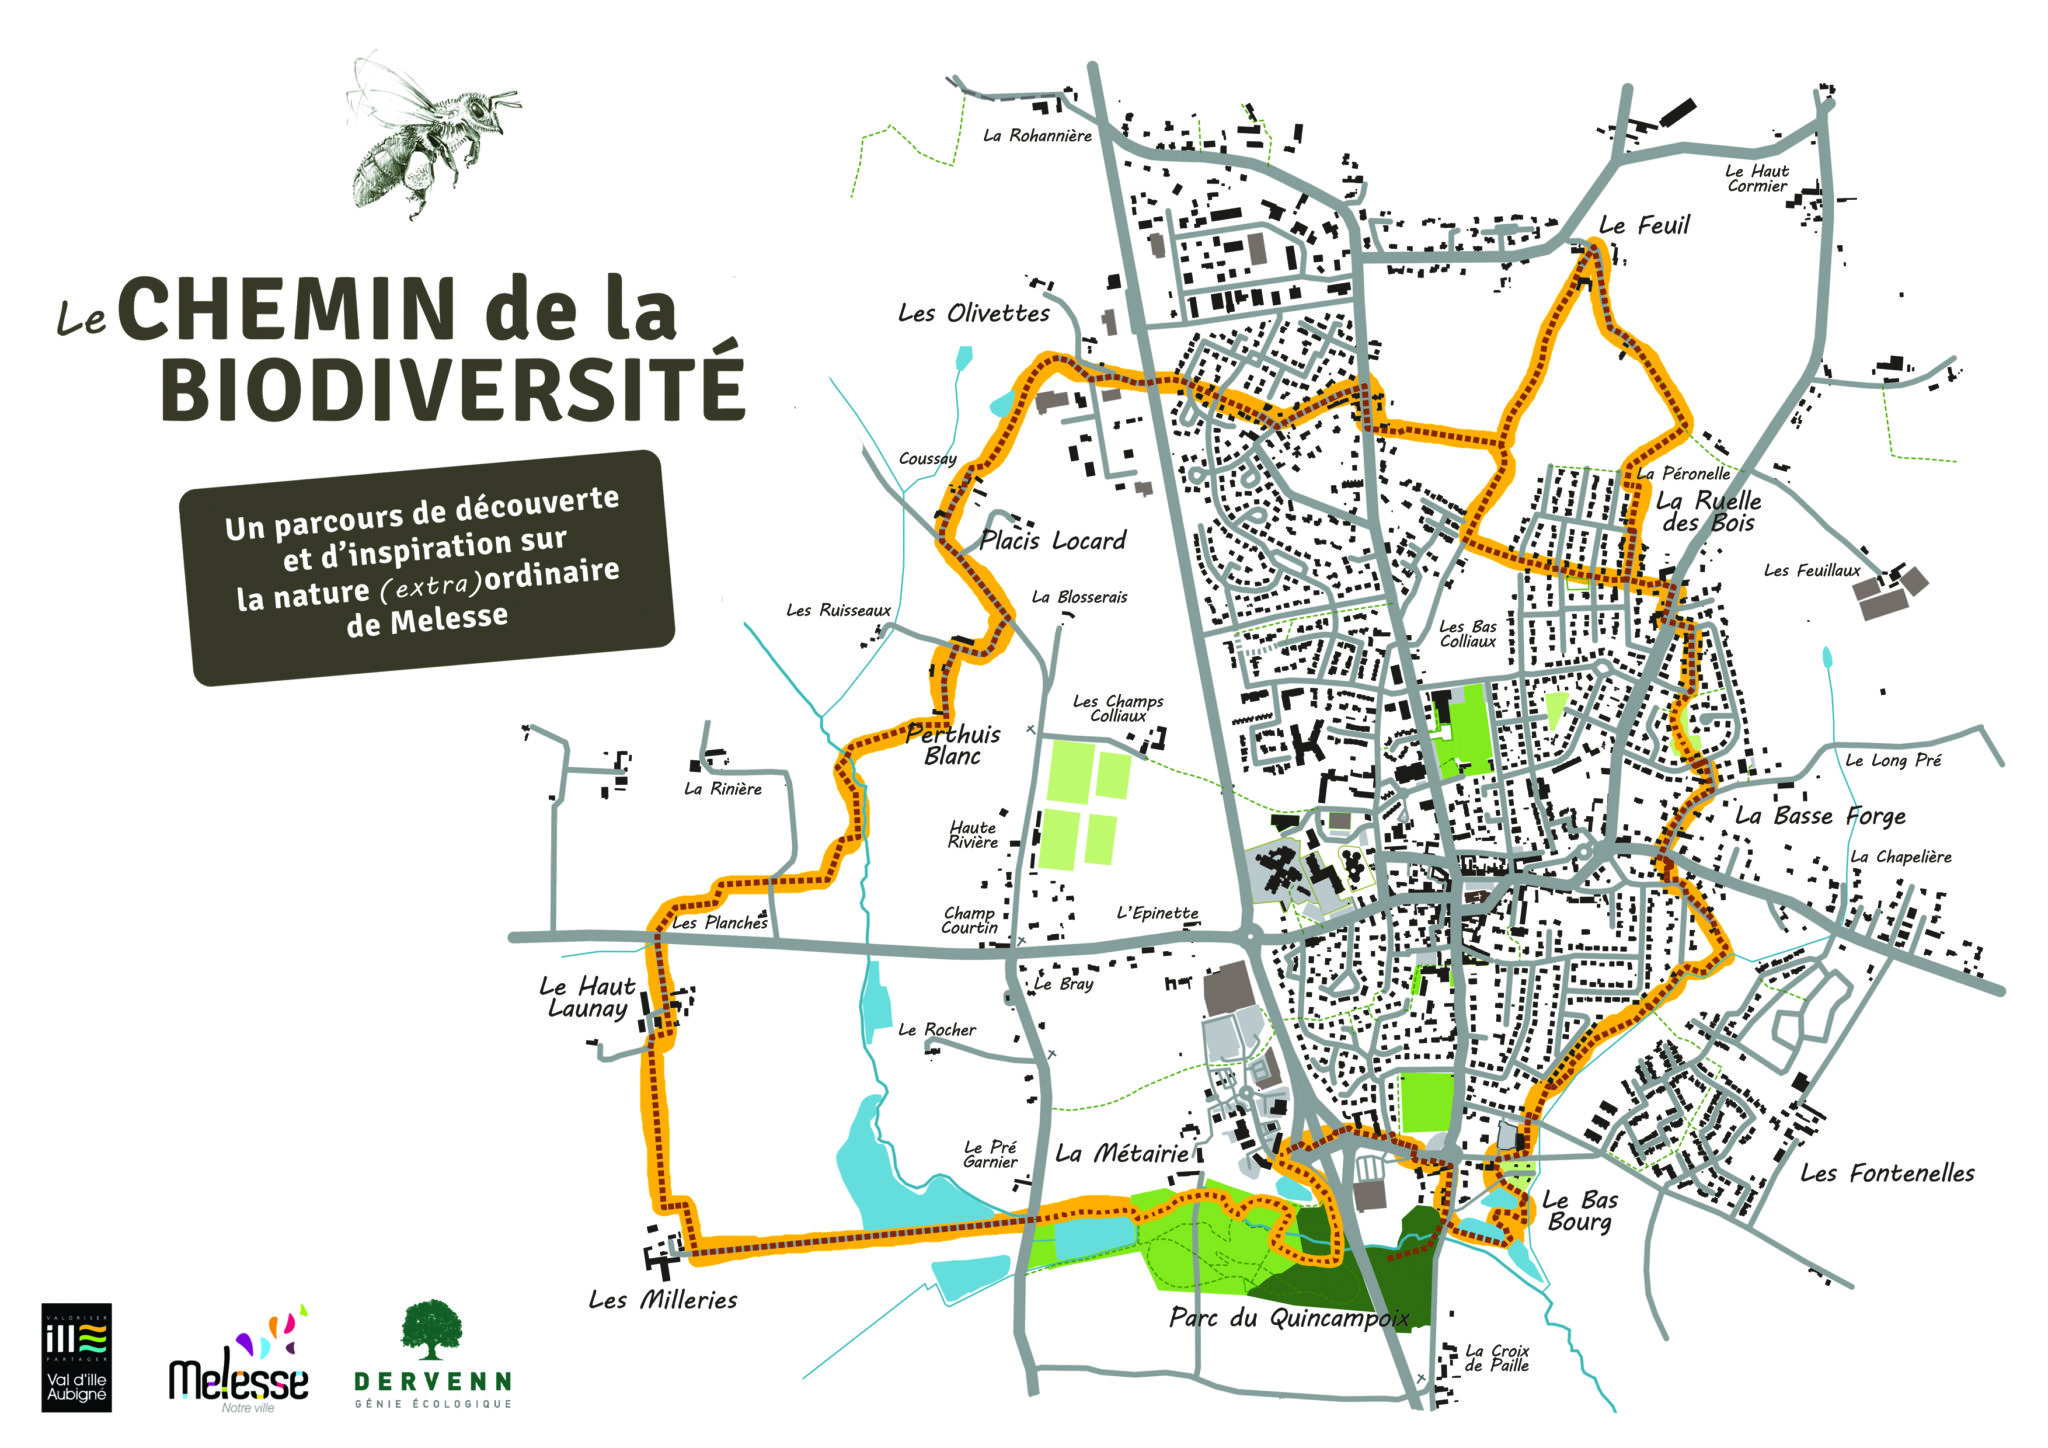 carte du chemin